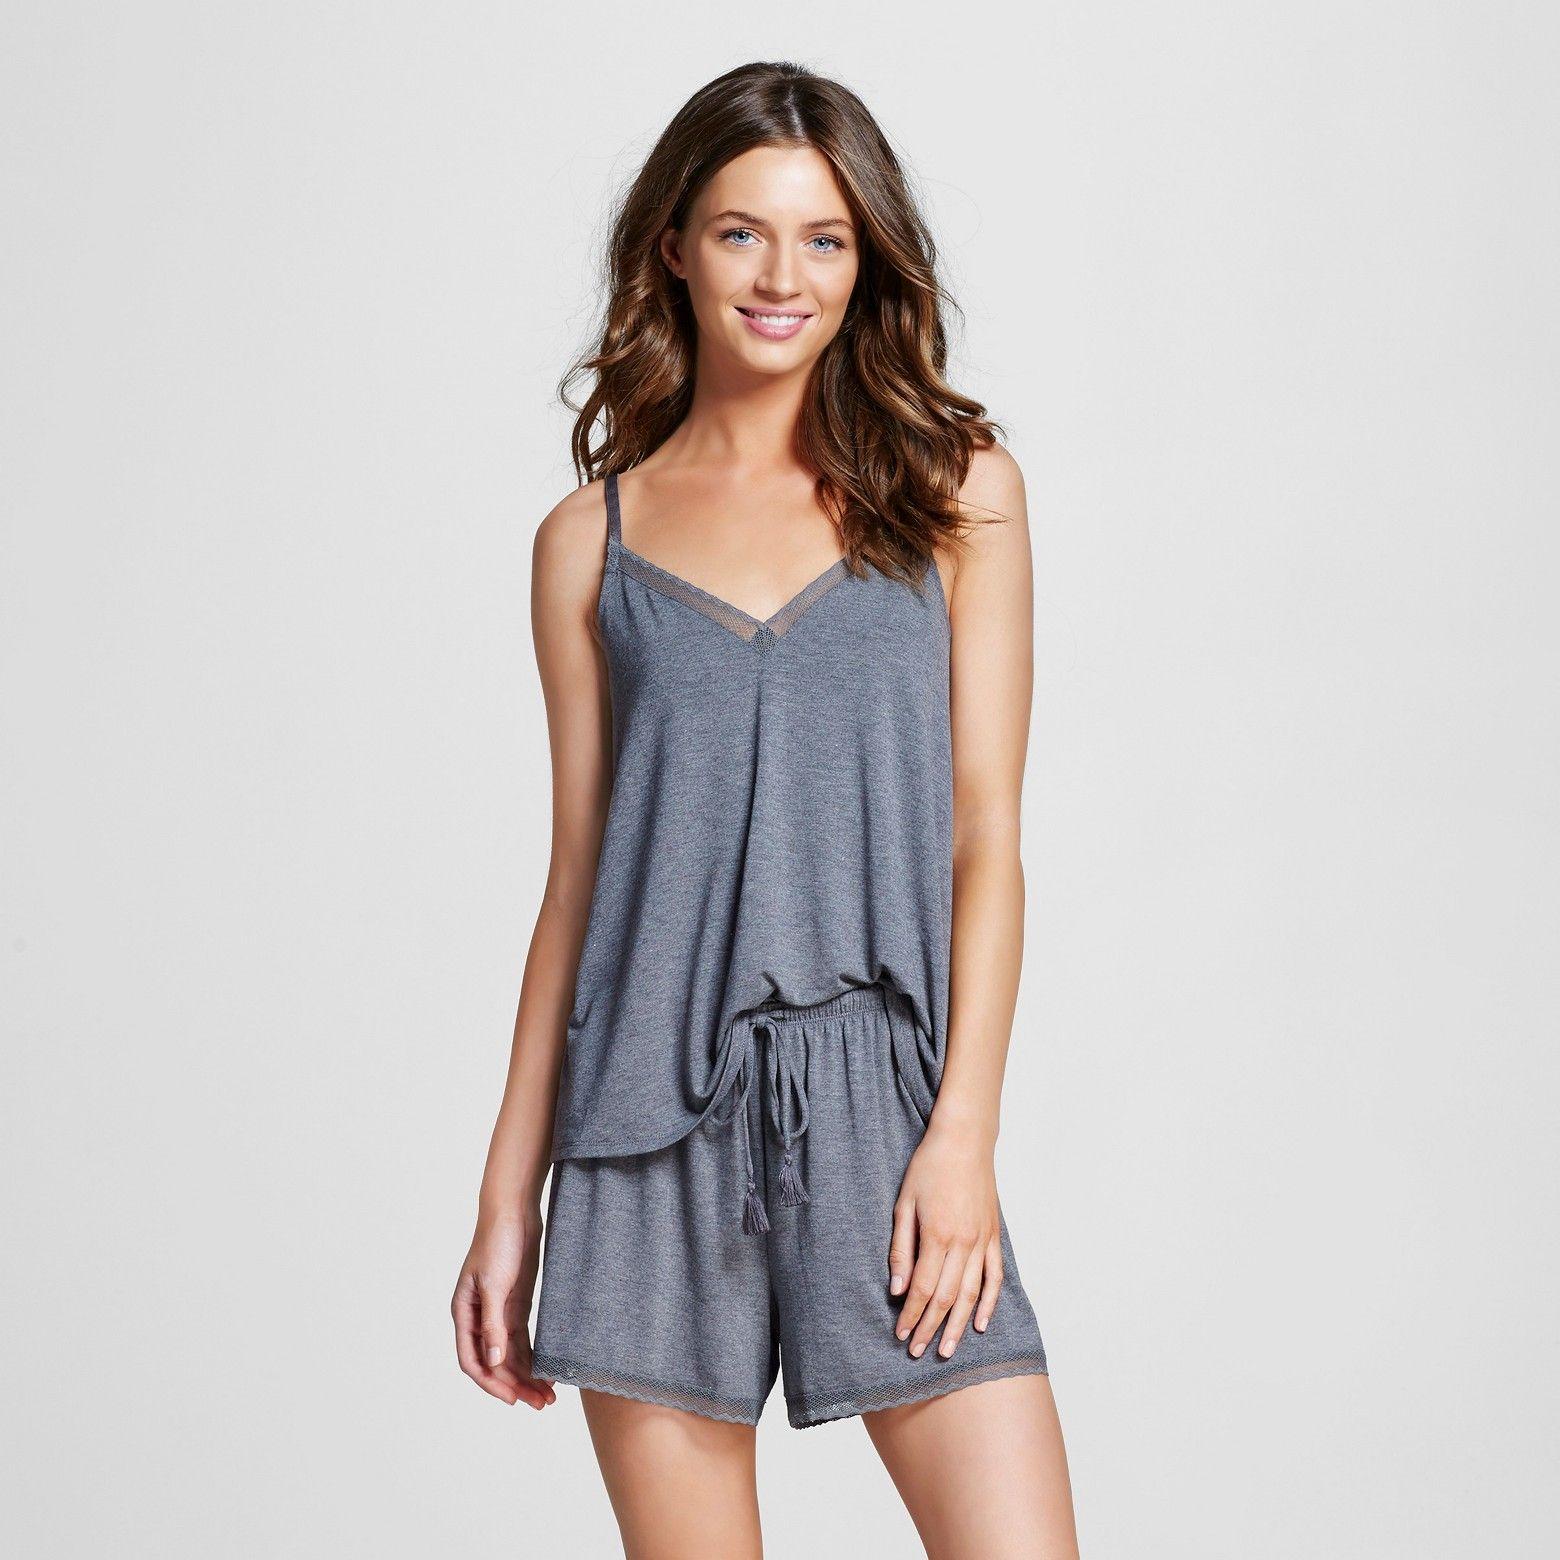 30c7118dcb93 Gilligan   O Malley Women s Pajama Set Total Comfort